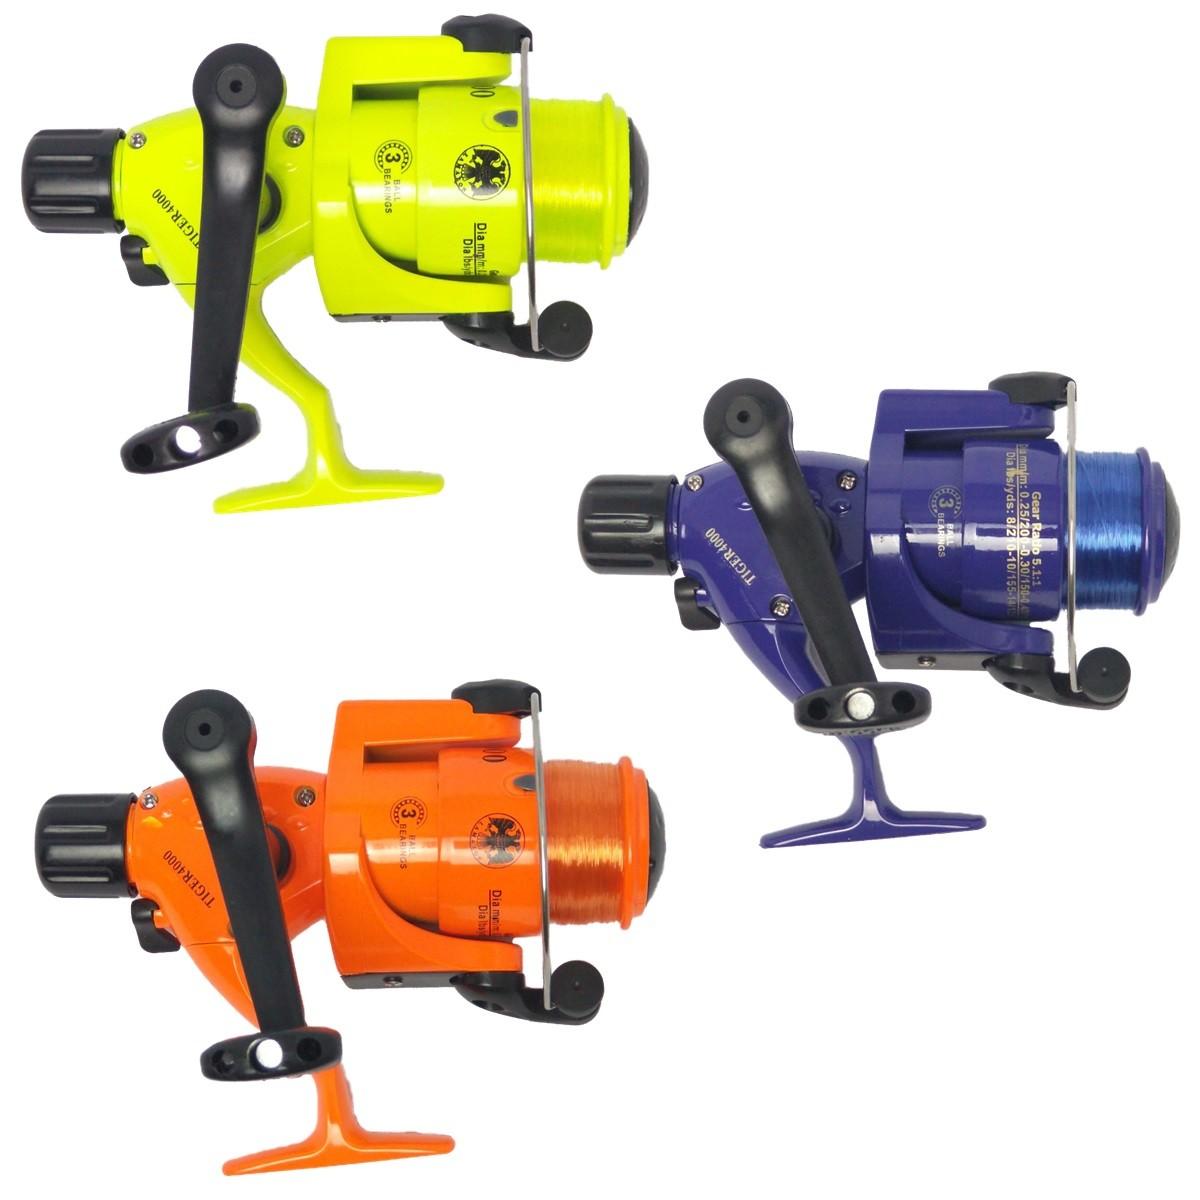 Kit Pesca Completo 2 Varas Telescopicas 2 Molinetes 4000 e Itens